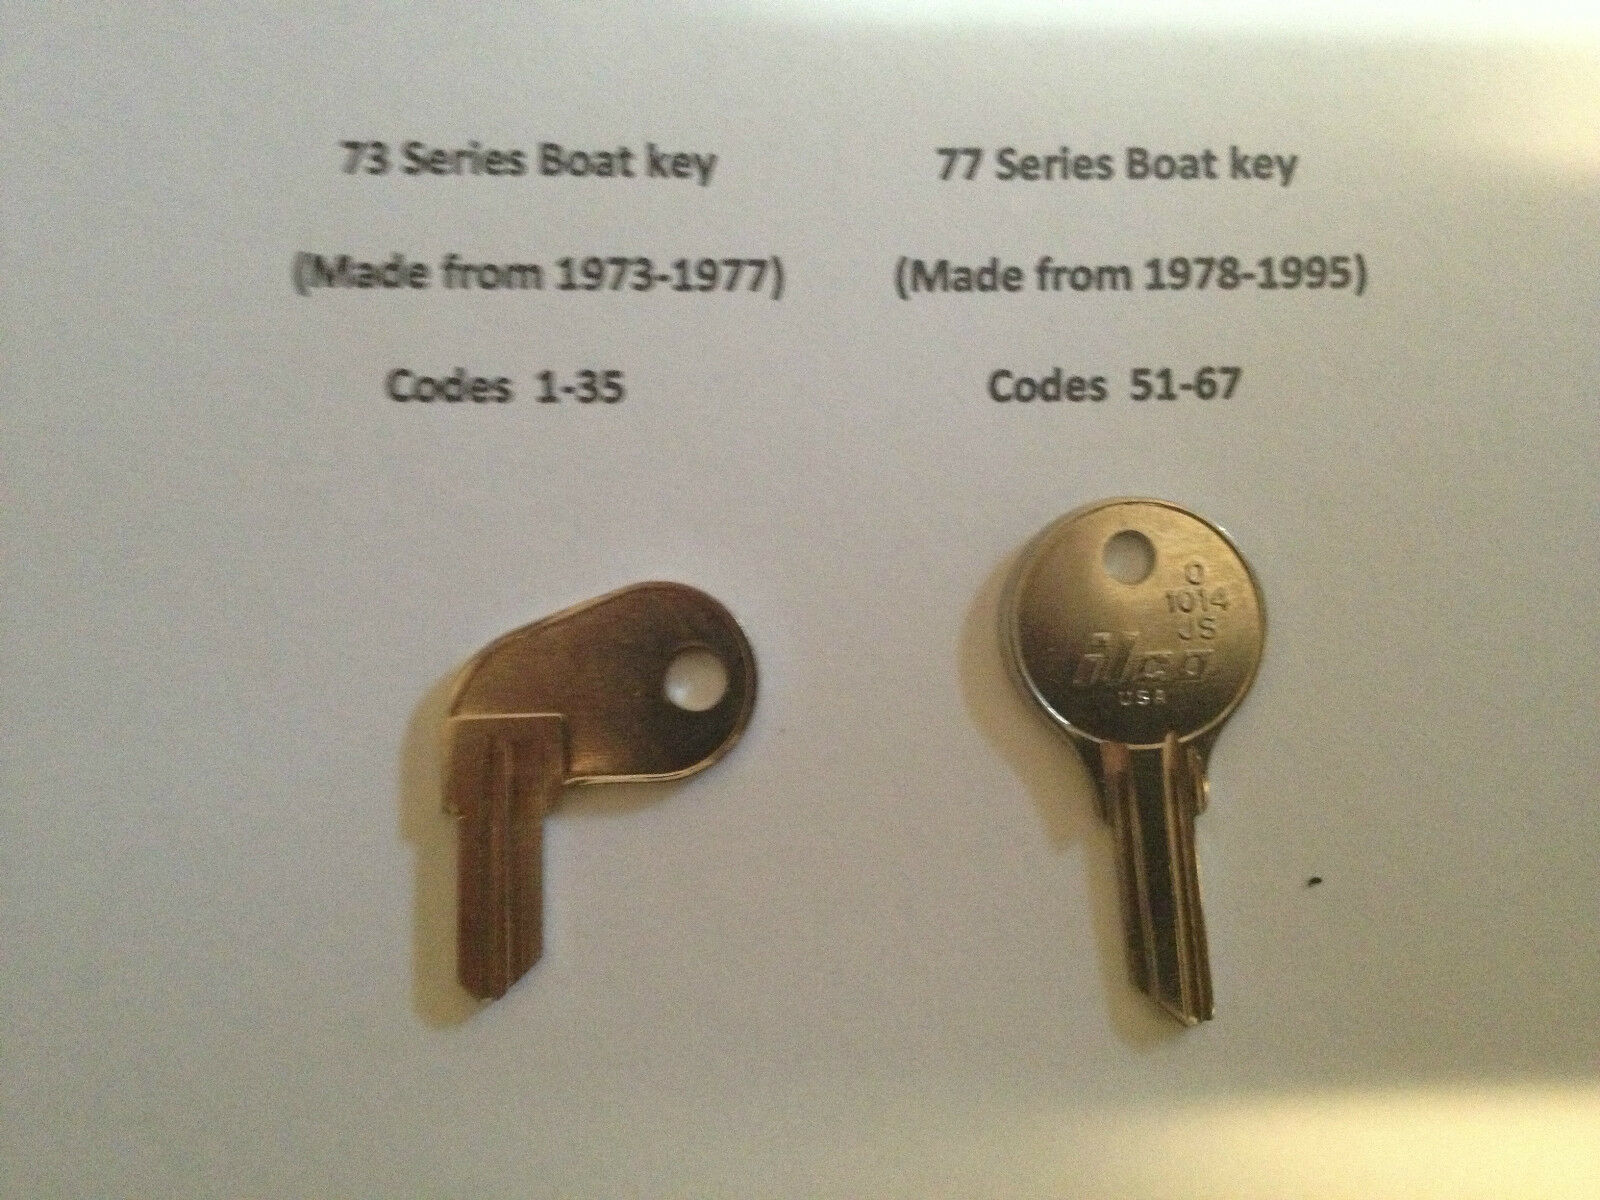 2 Key Evenrude-Johnston Boat keys-Codes 1-35 & 51-67 Ignition-Pollock-Key